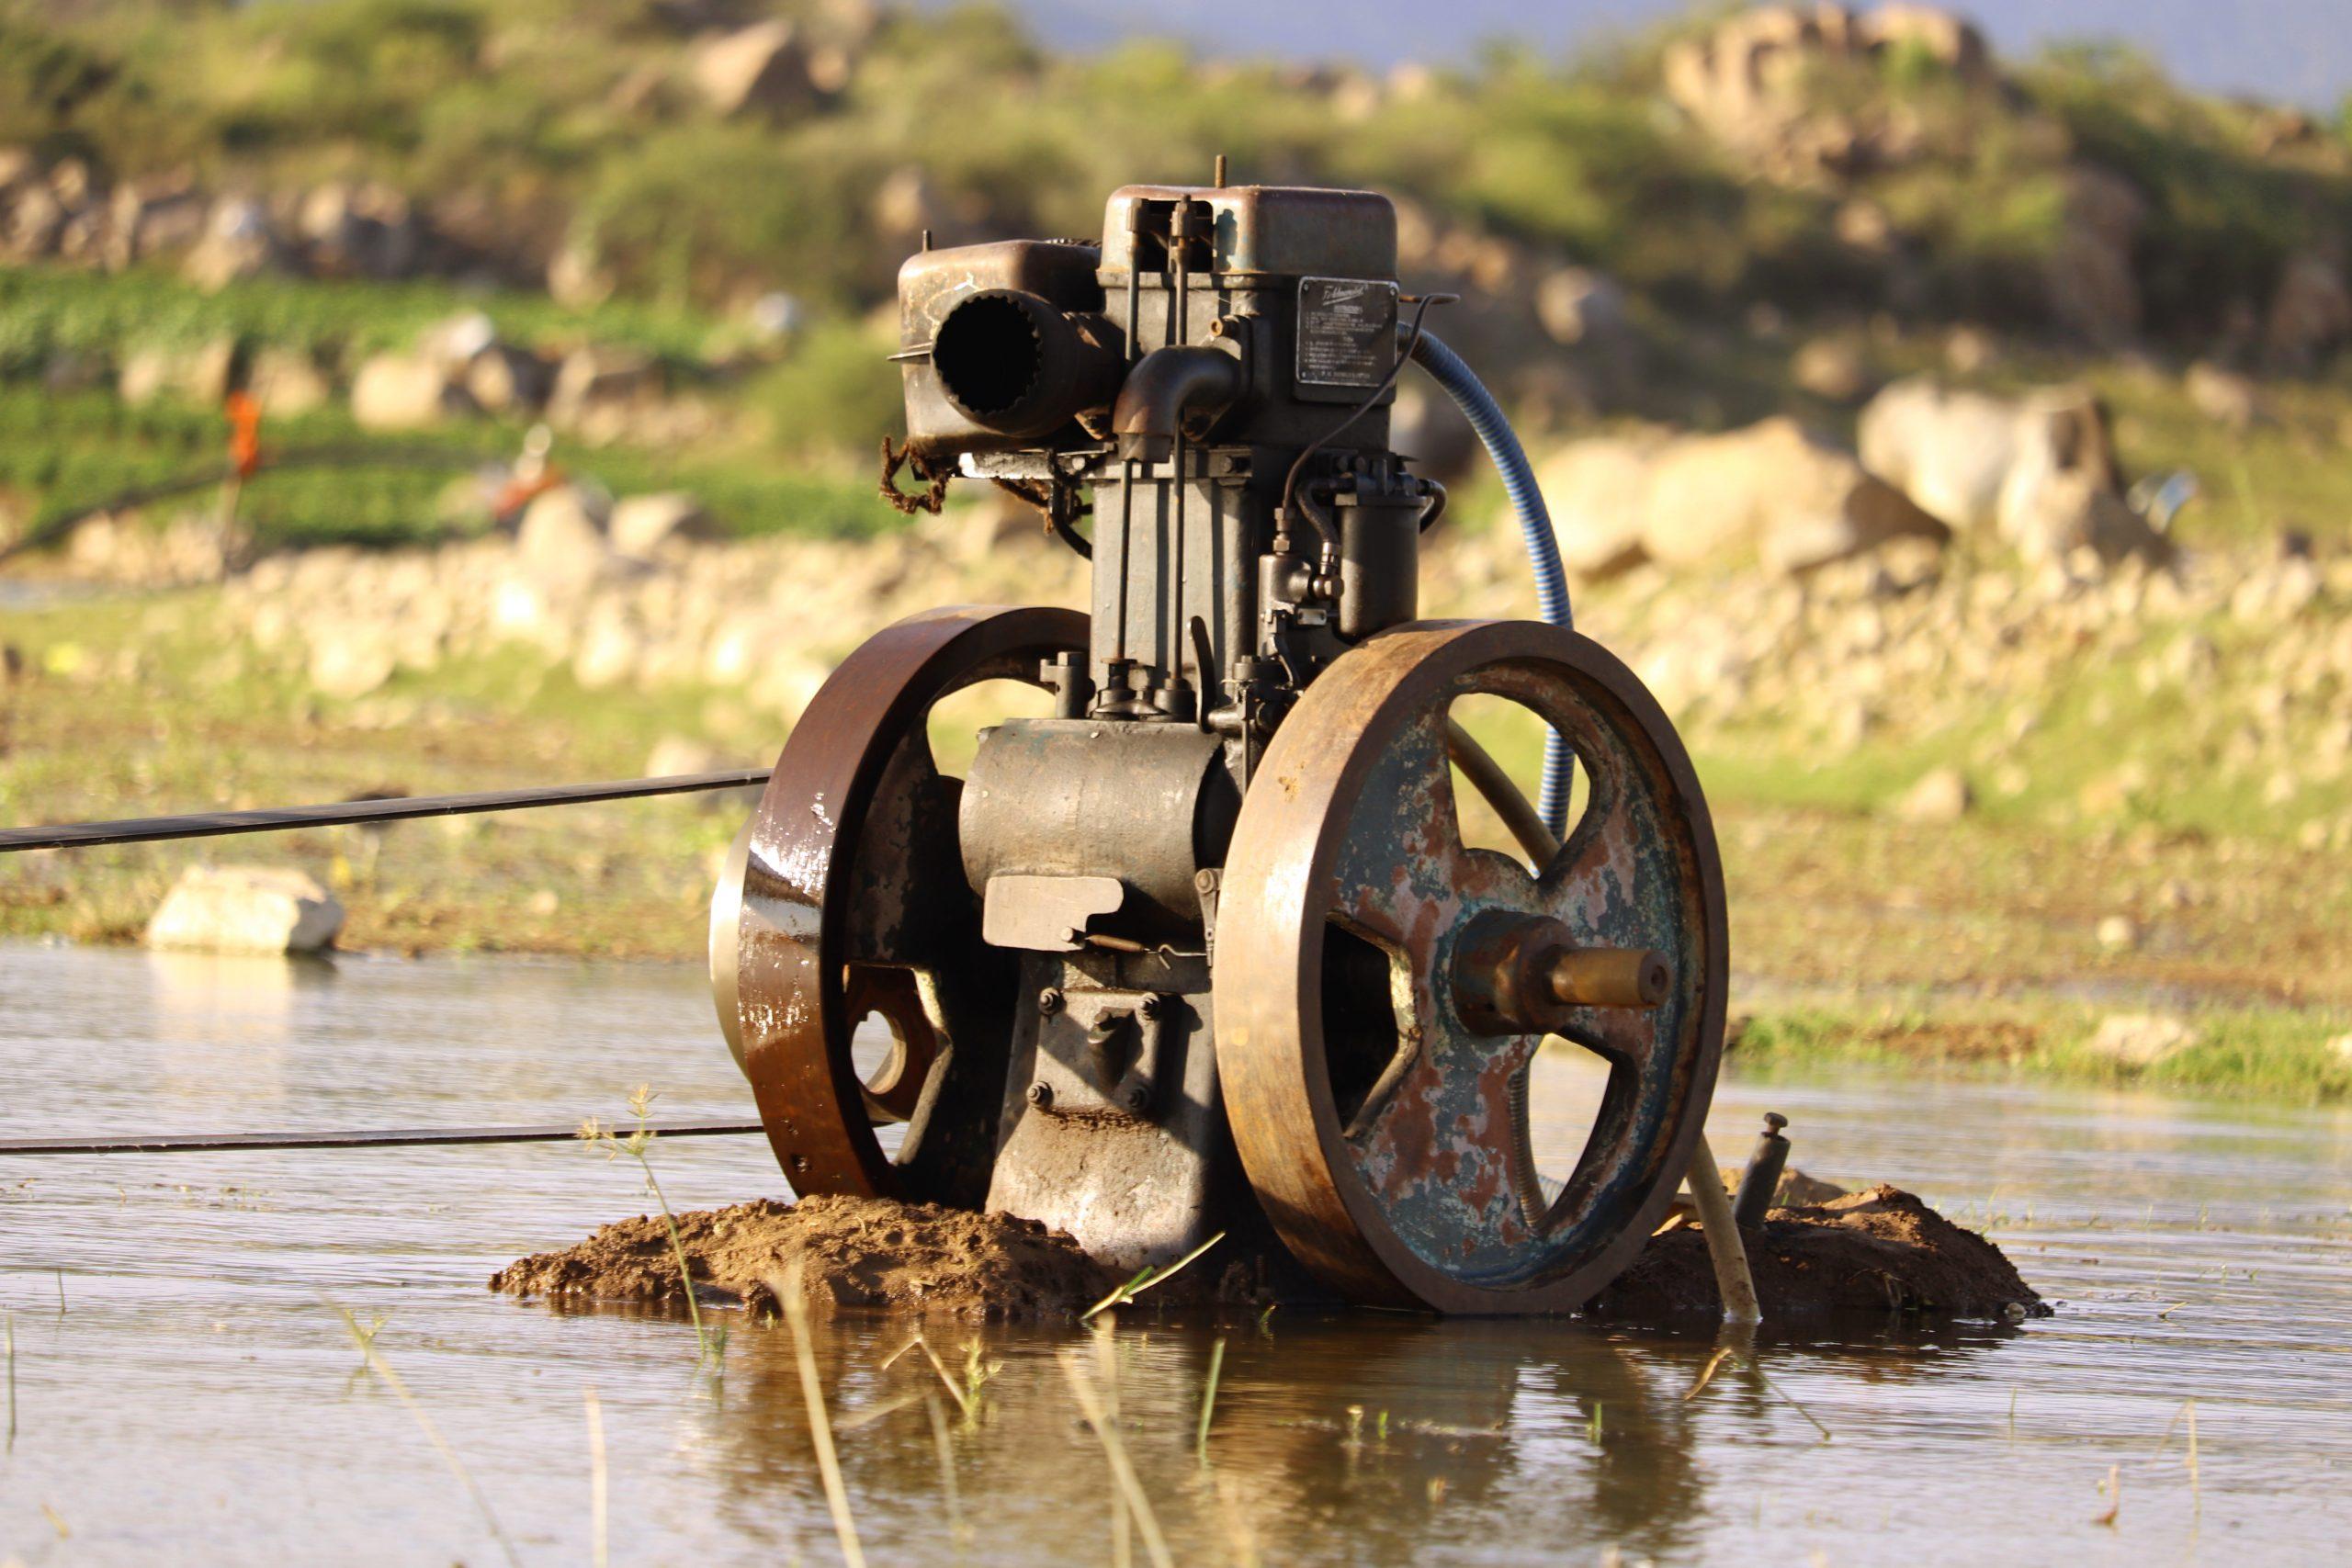 A motor in a river